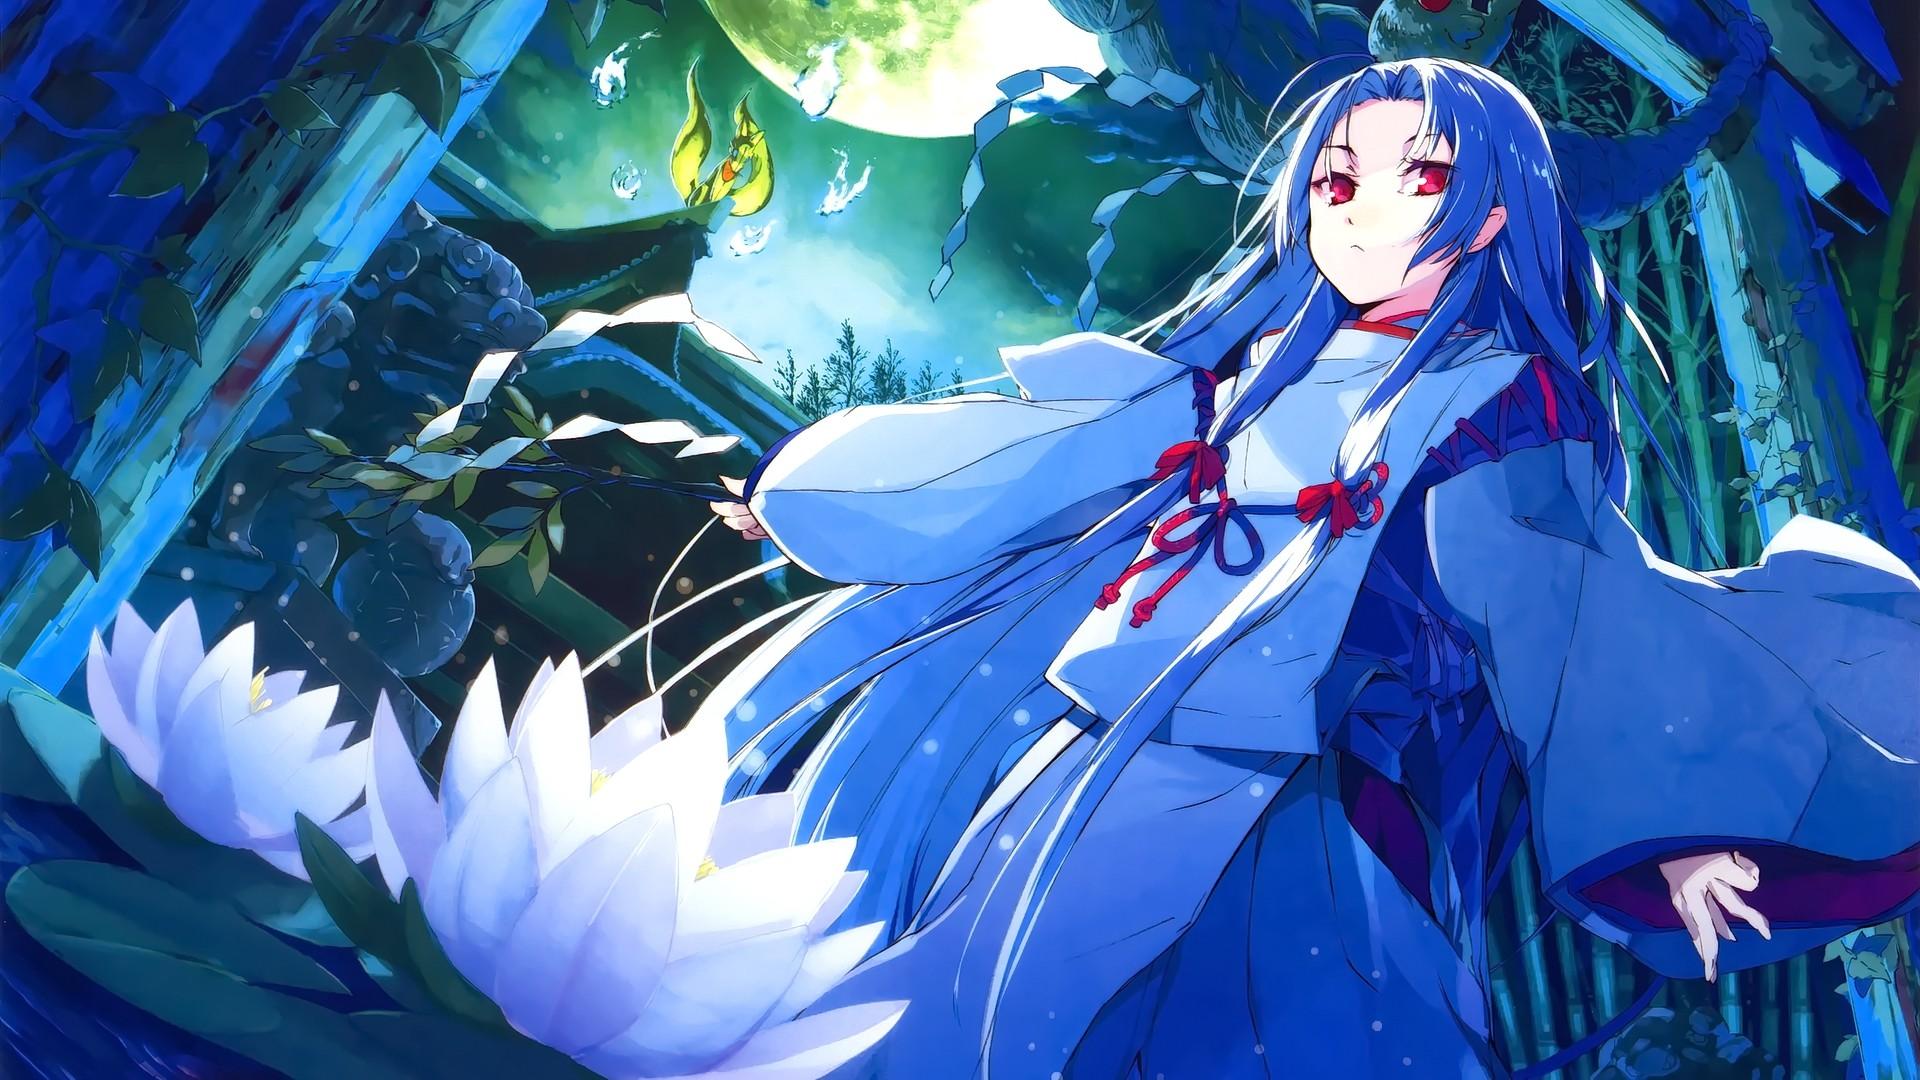 Anime 1920x1080 anime anime girls original characters lotus flowers red eyes shrine miko